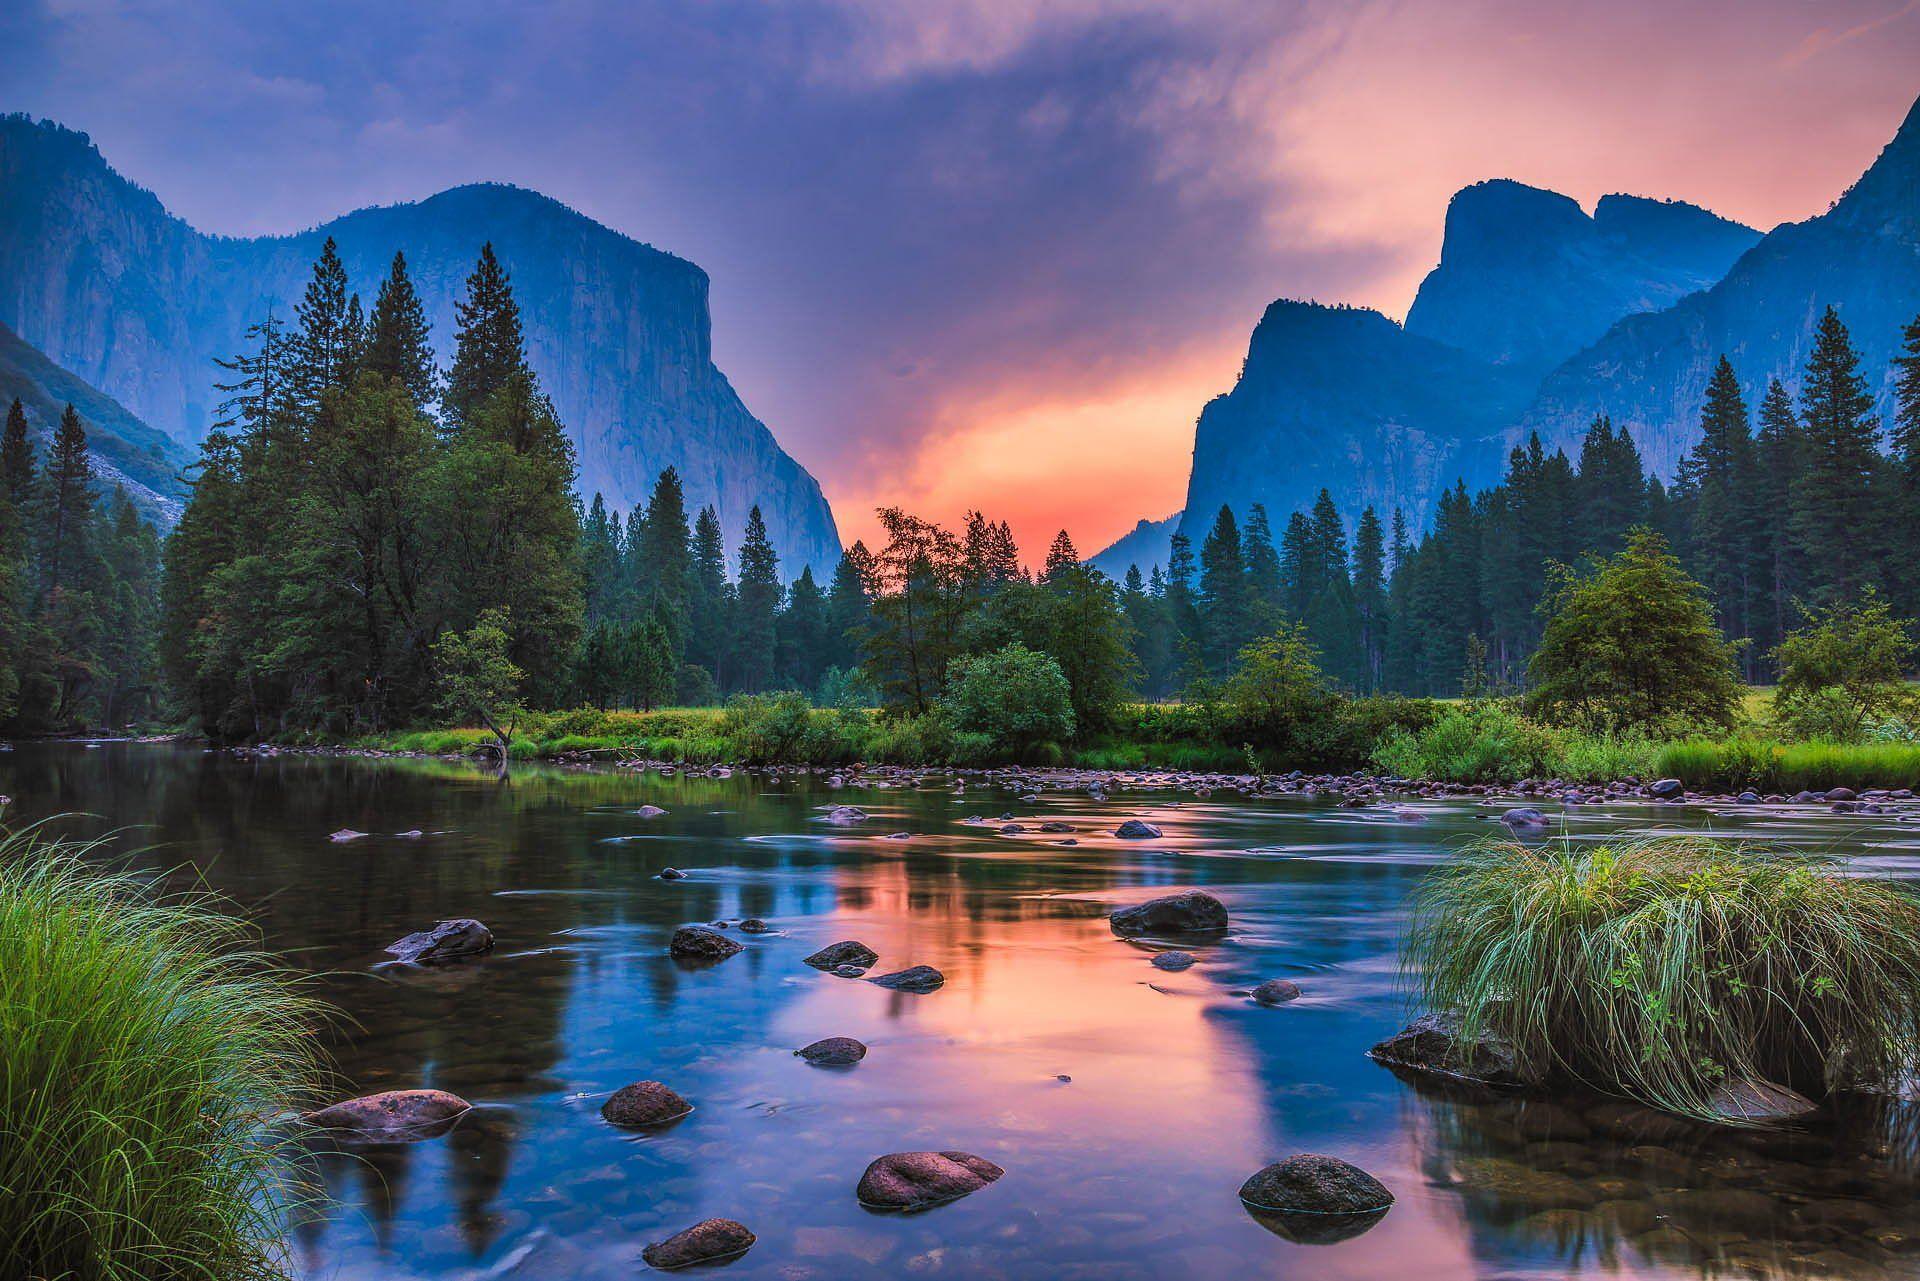 36 Landscape Nature Sunset Mountains River Reflection Wallpaper California National Parks National Parks Nature